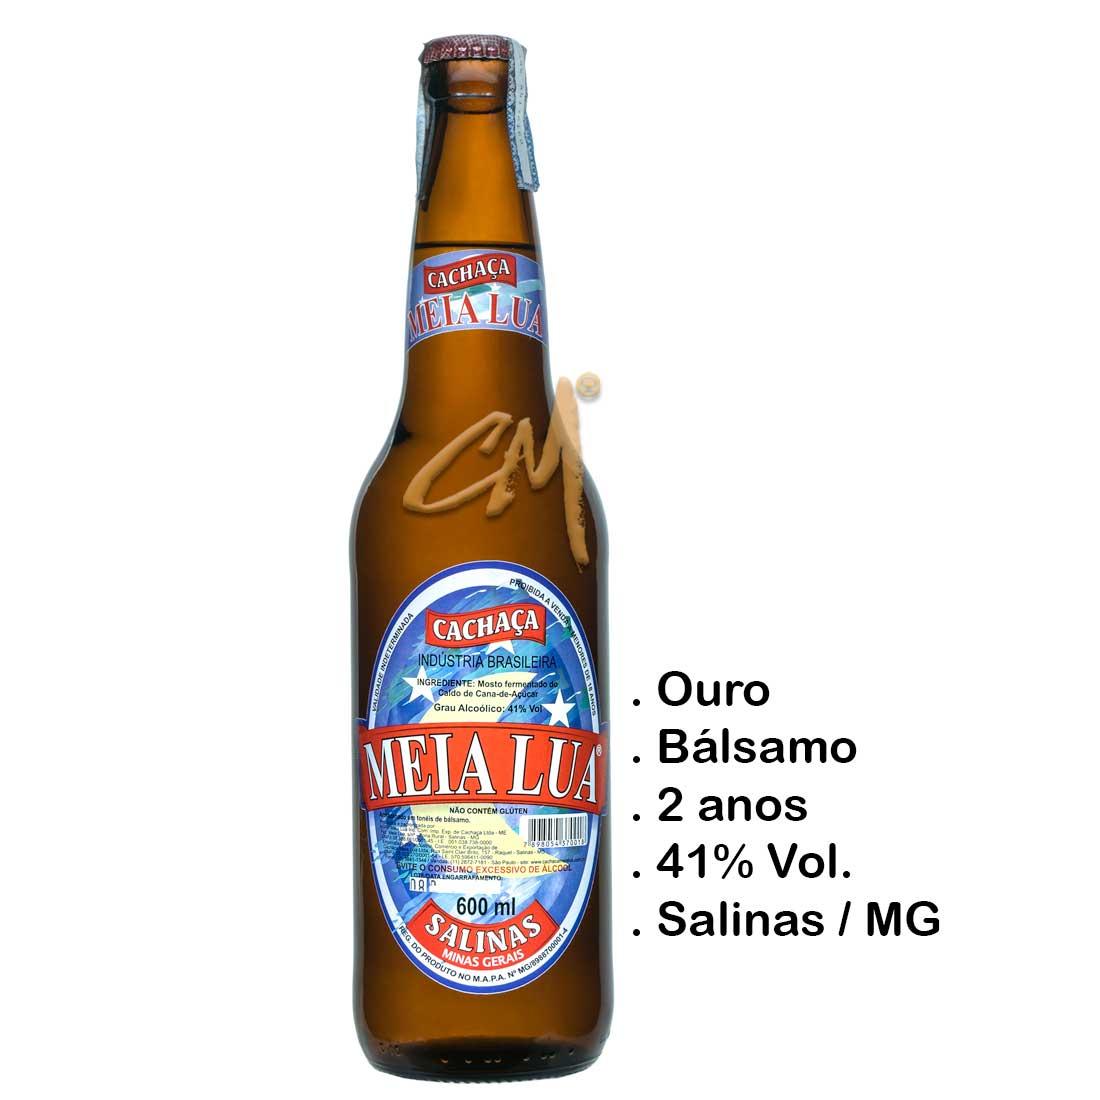 Cachaça Meia Lua Ouro 600 ml (Salinas - MG)